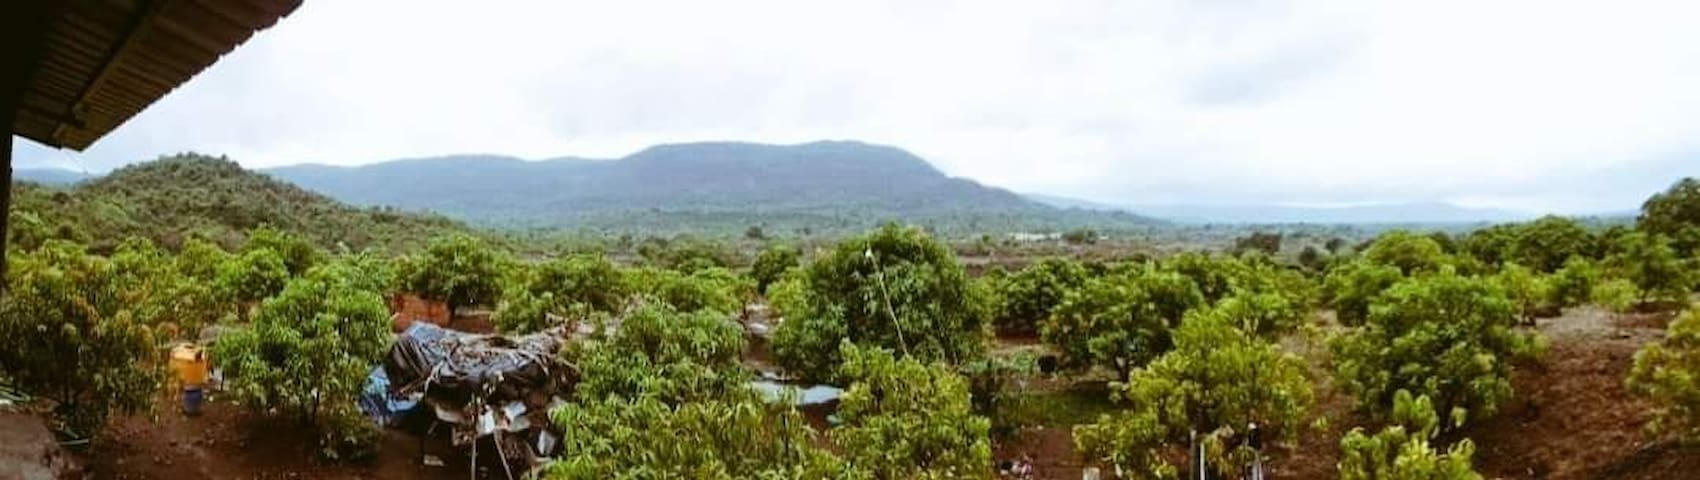 Shinde Farms,River Side Alphonse, Coconut Farm